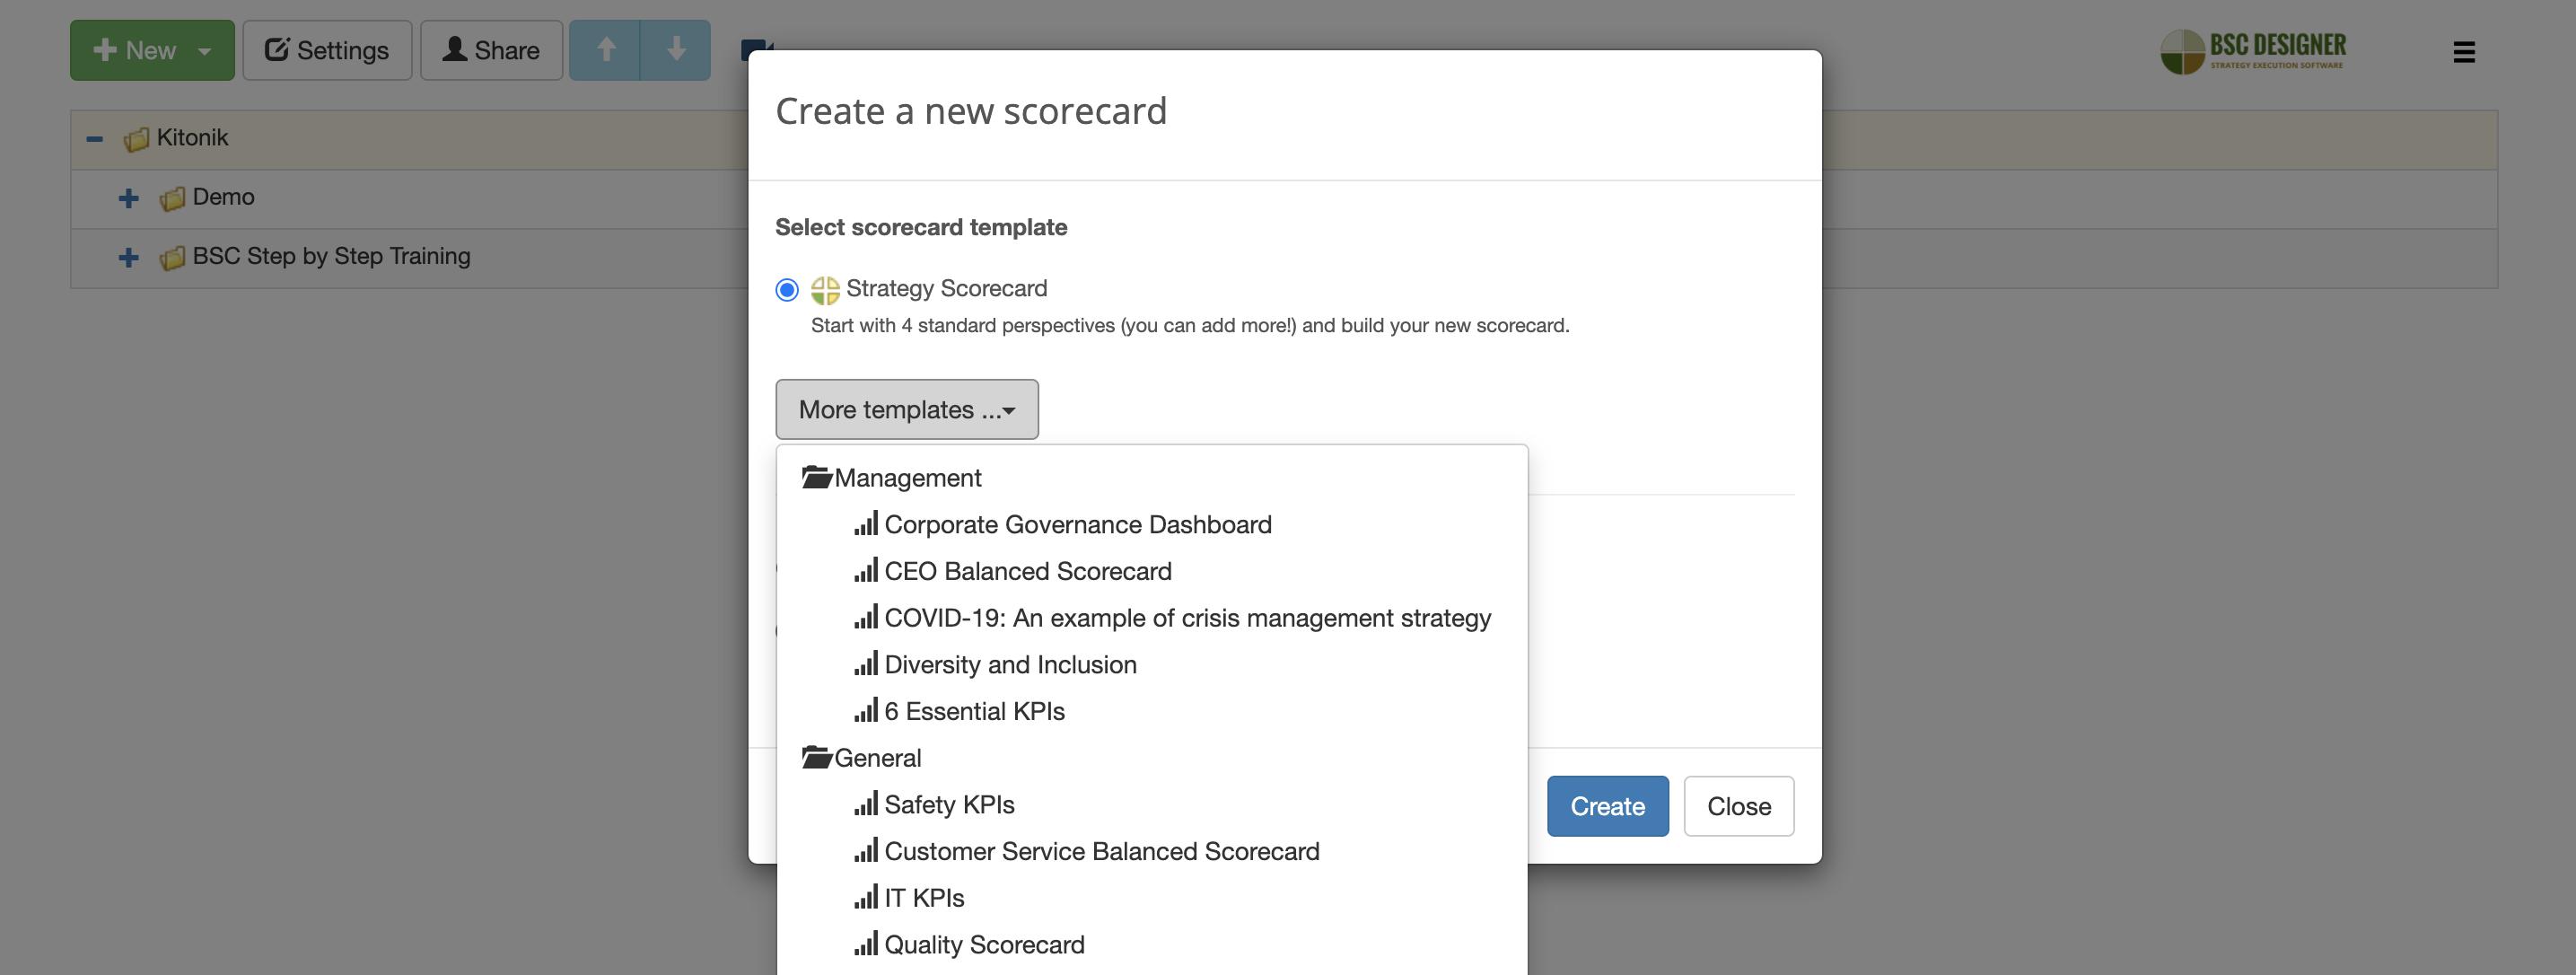 Create new scorecard with a template